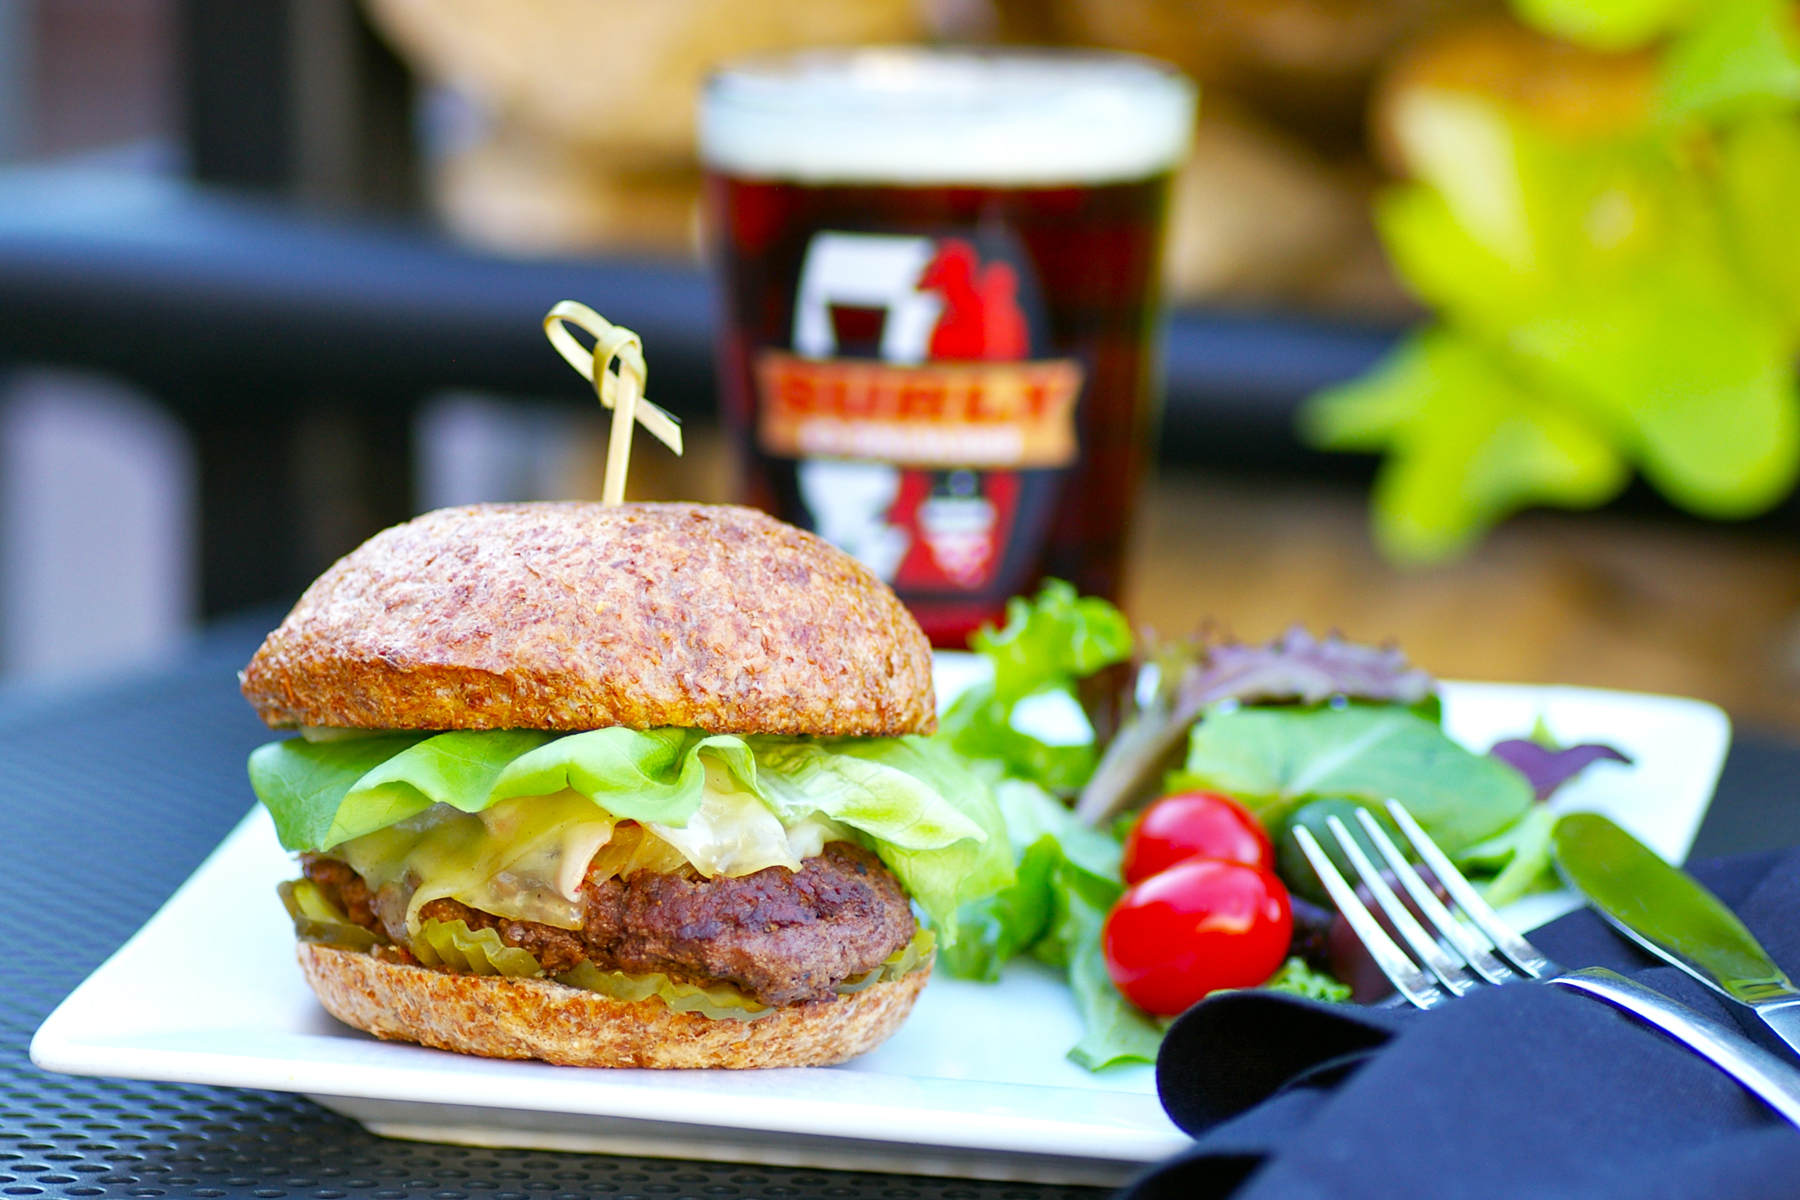 po-burger-1